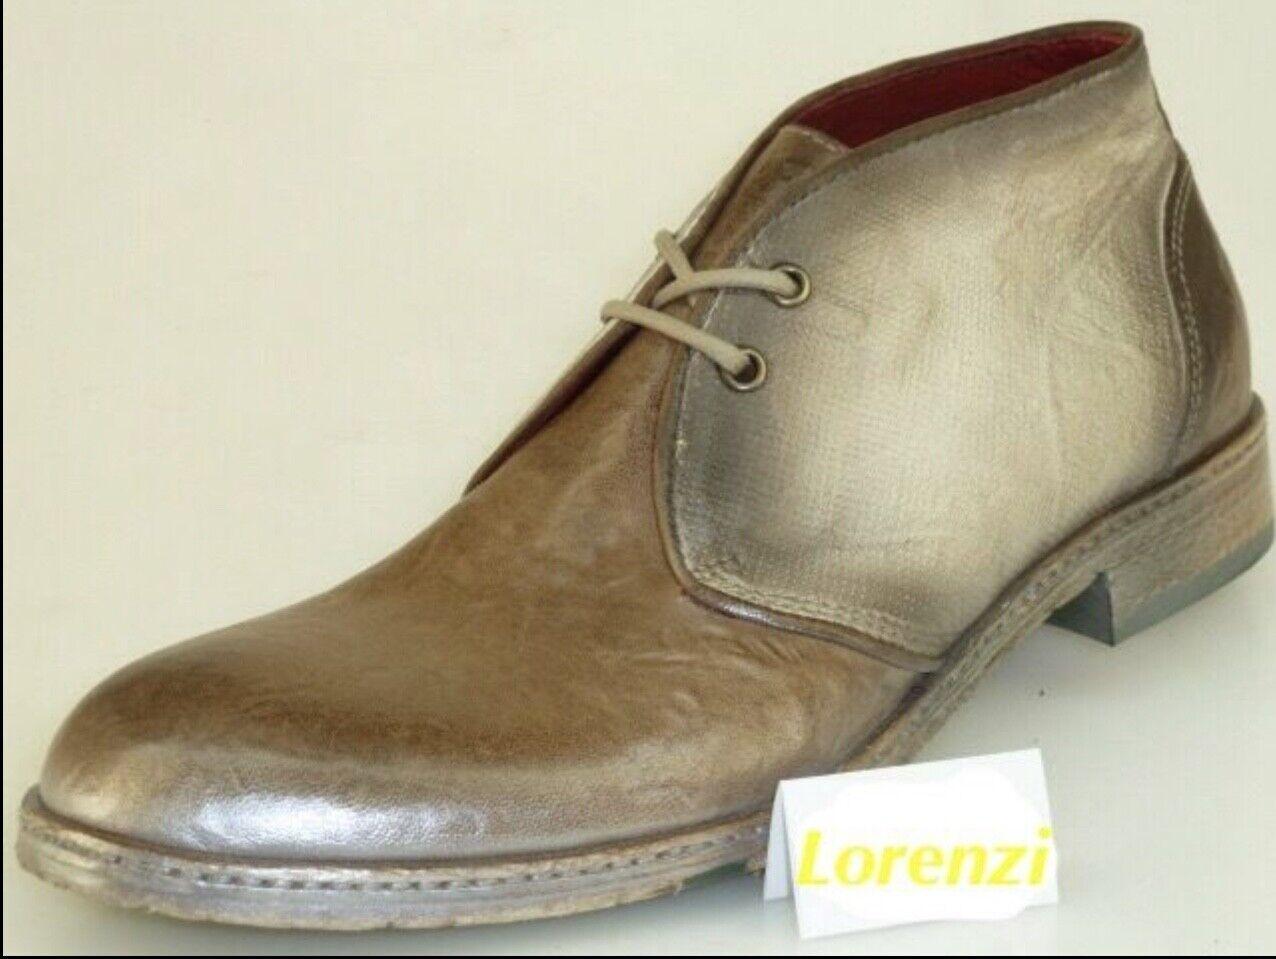 Schuhe von Lorenzi Mens Made  Leder Handmade Lace Up Italian Stiefel EUR 41   42